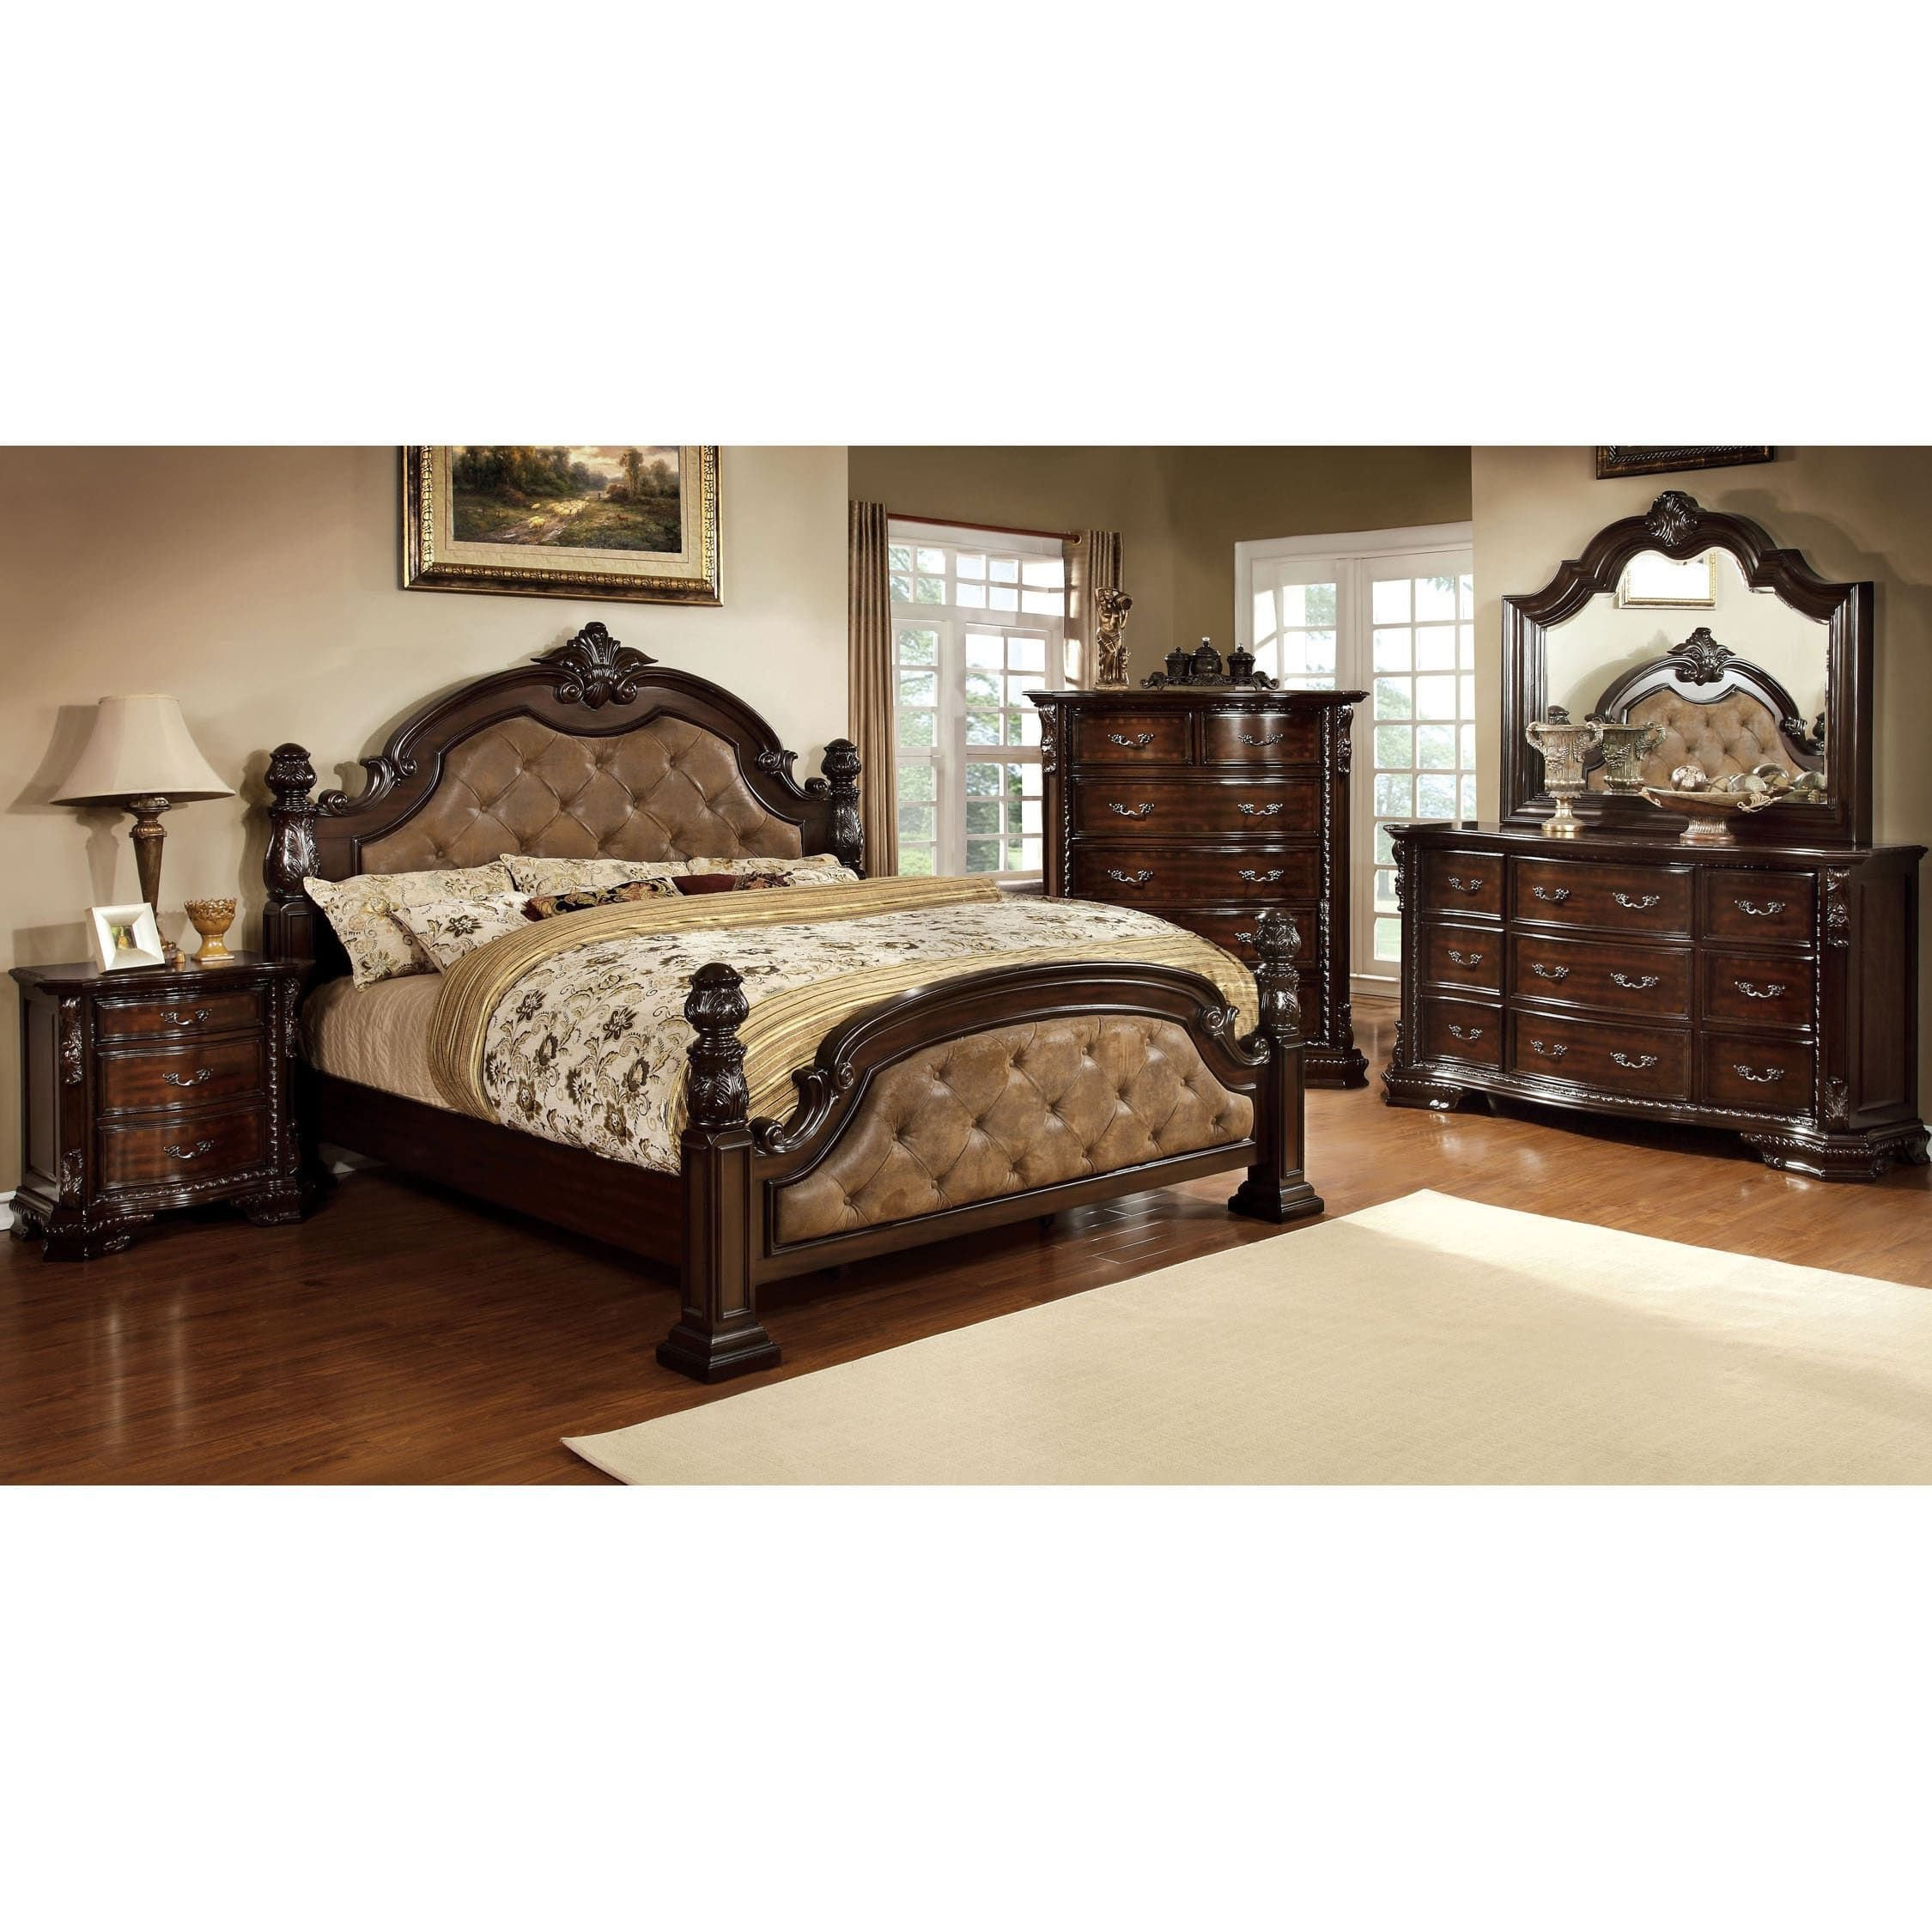 4 Piece Bedroom Set Unique Kassania Traditional 4 Piece Bedroom Set by Foa California